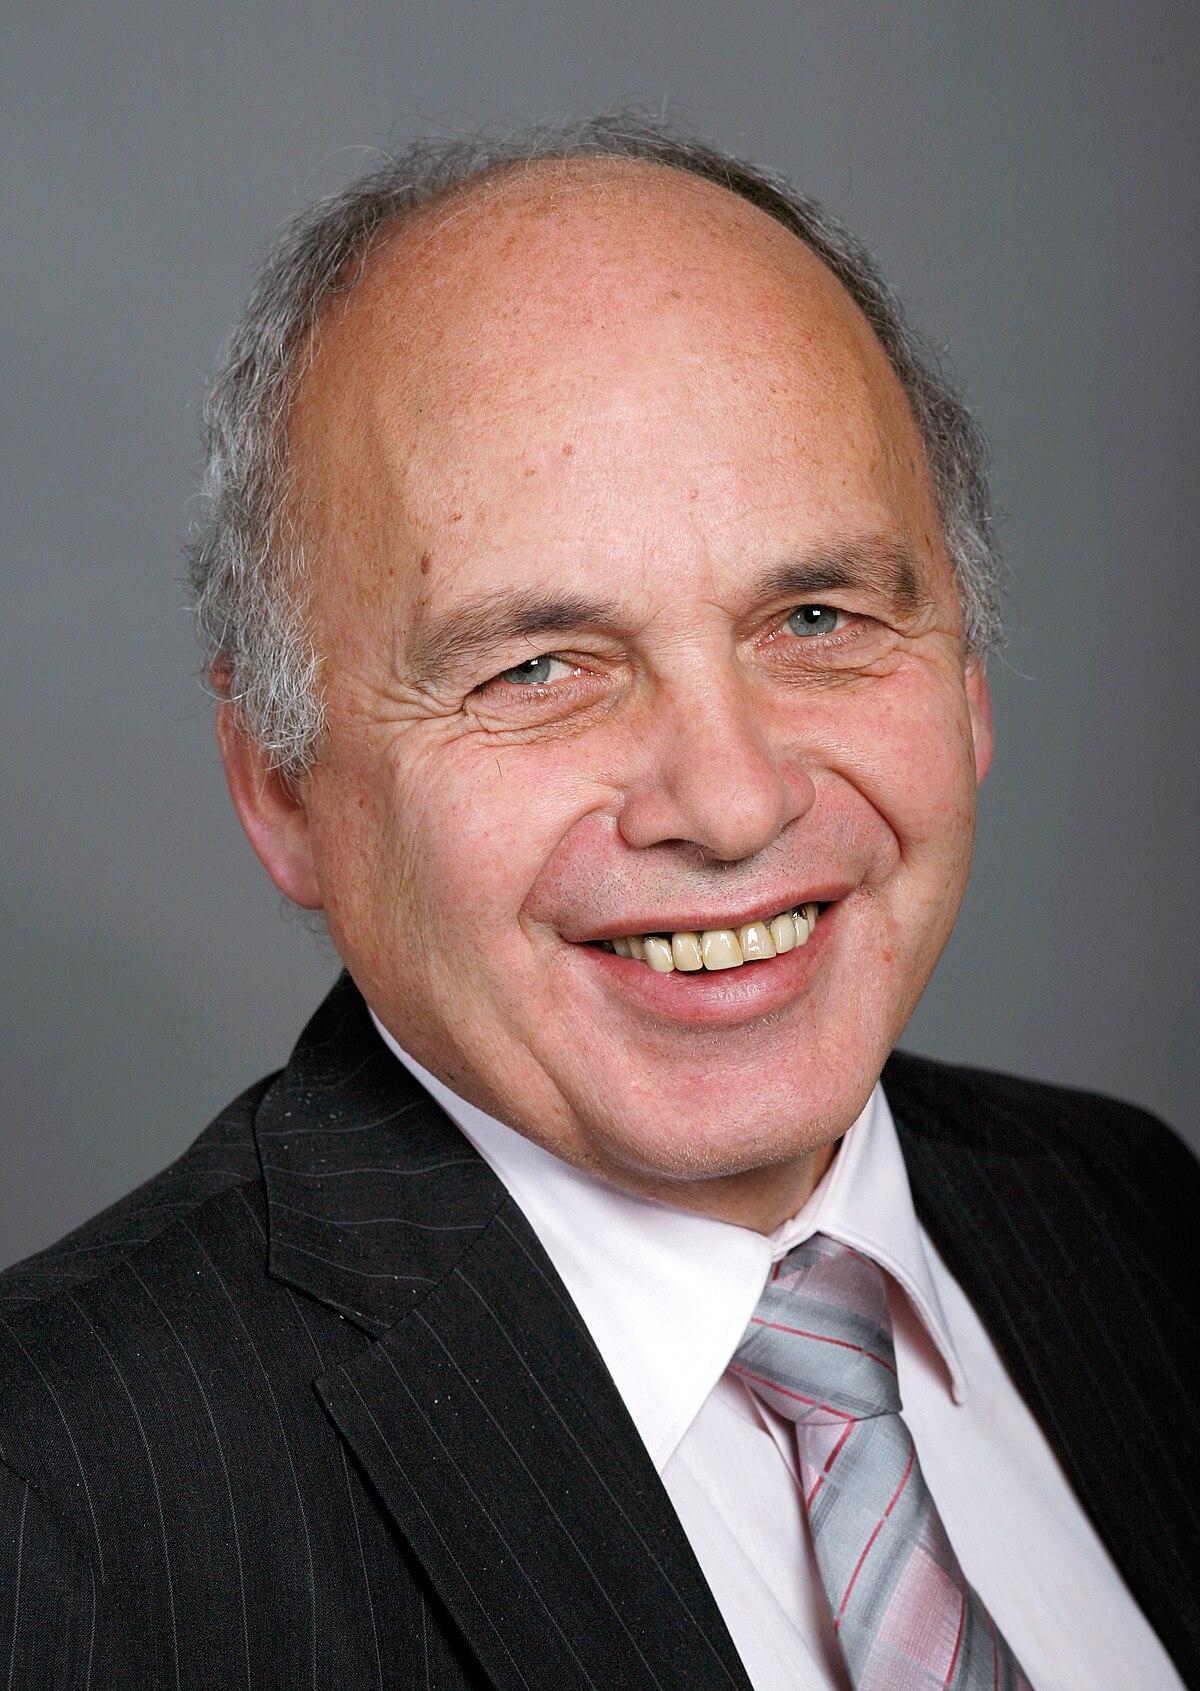 Swiss Federal Election 2003 Wikipedia